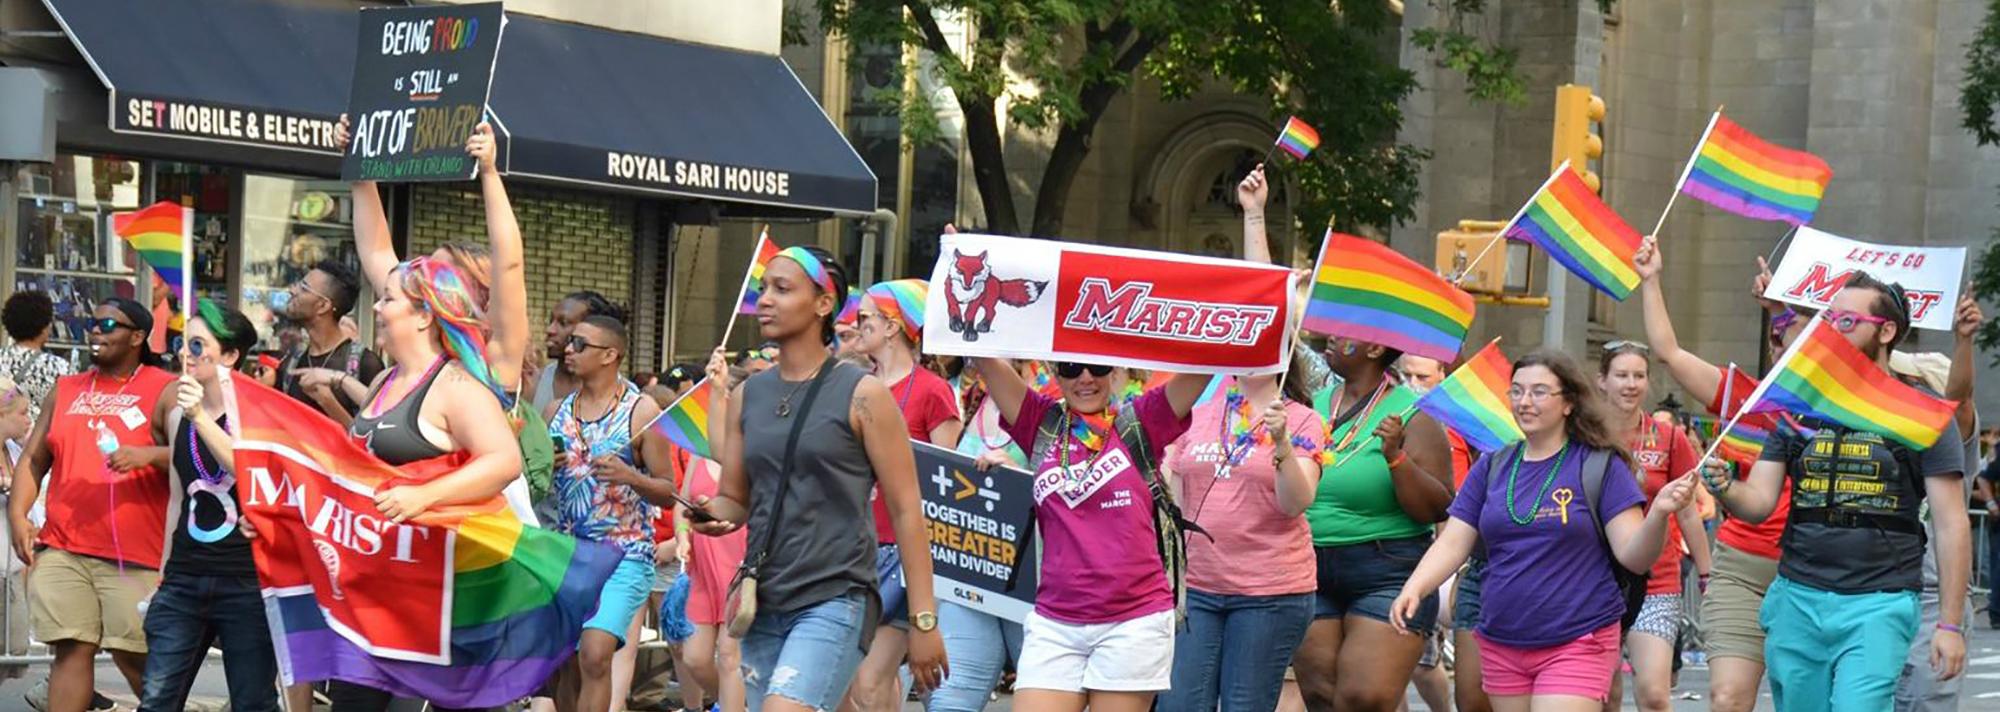 Marist Pride image